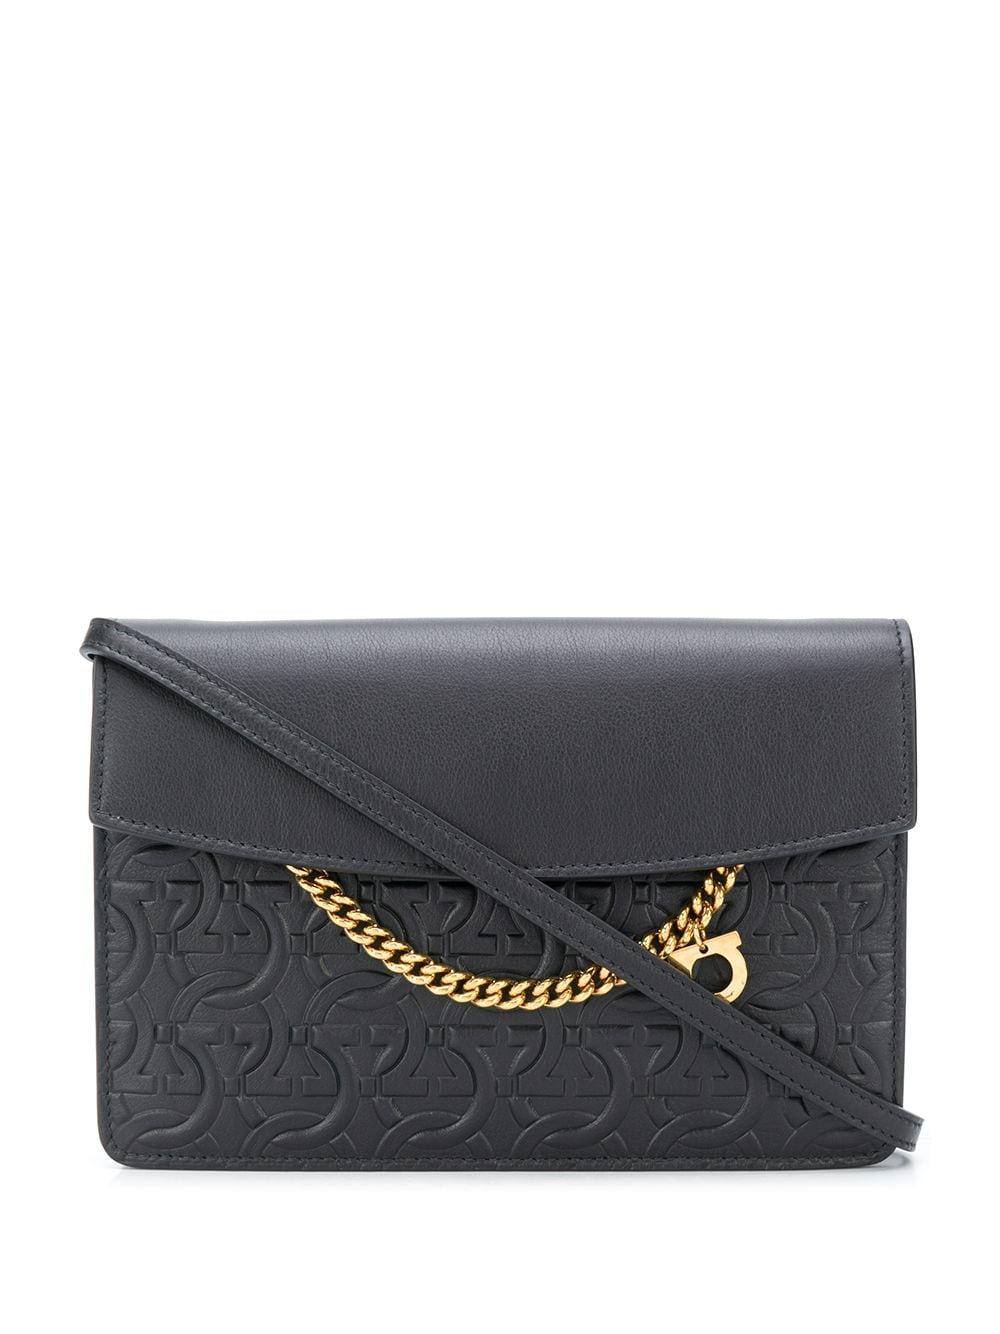 Gancini Leather Crossbody Bag